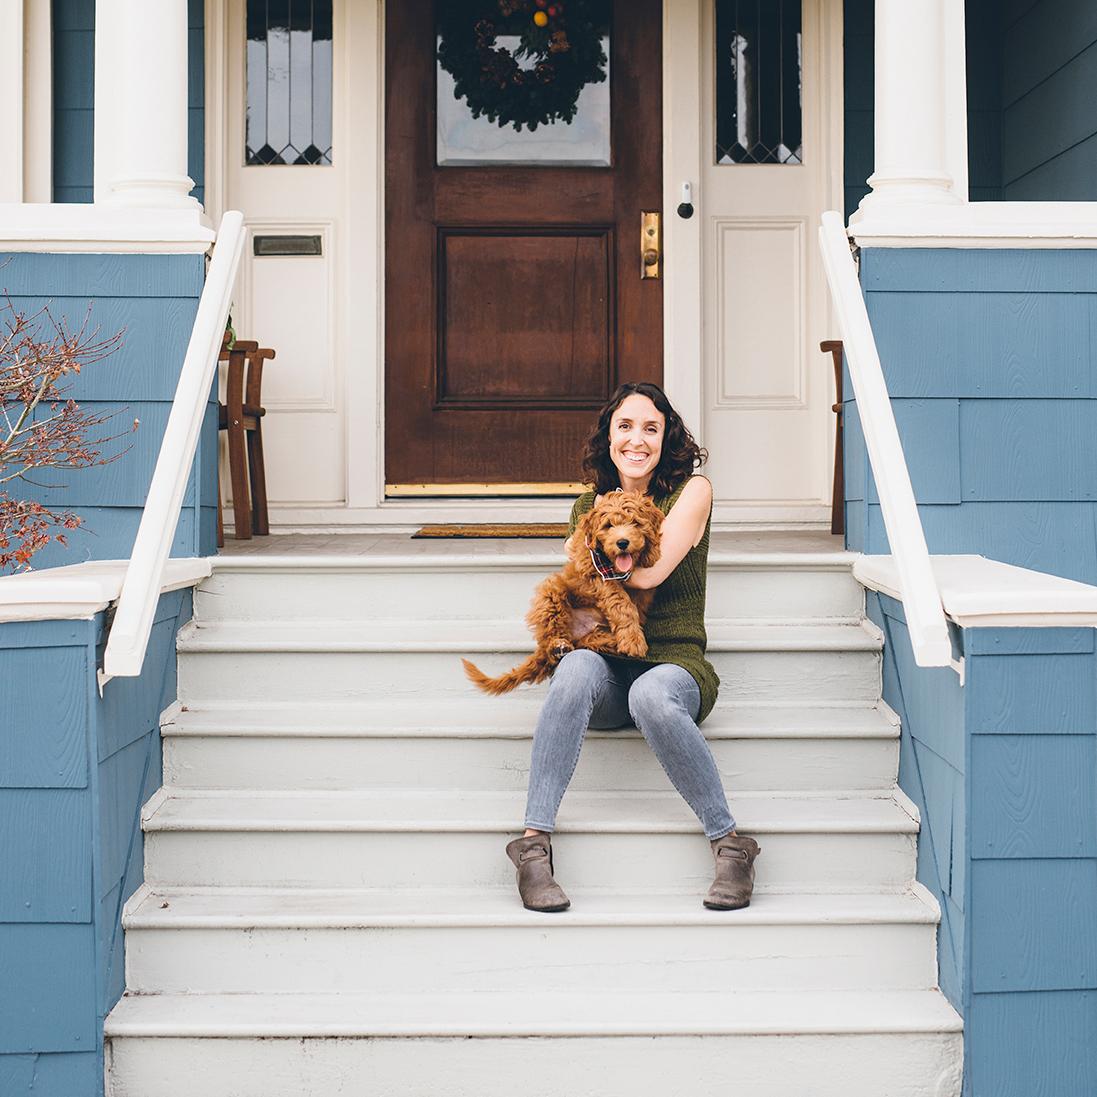 Sonya Yruel with her goldendoodle puppy, Sequoia.